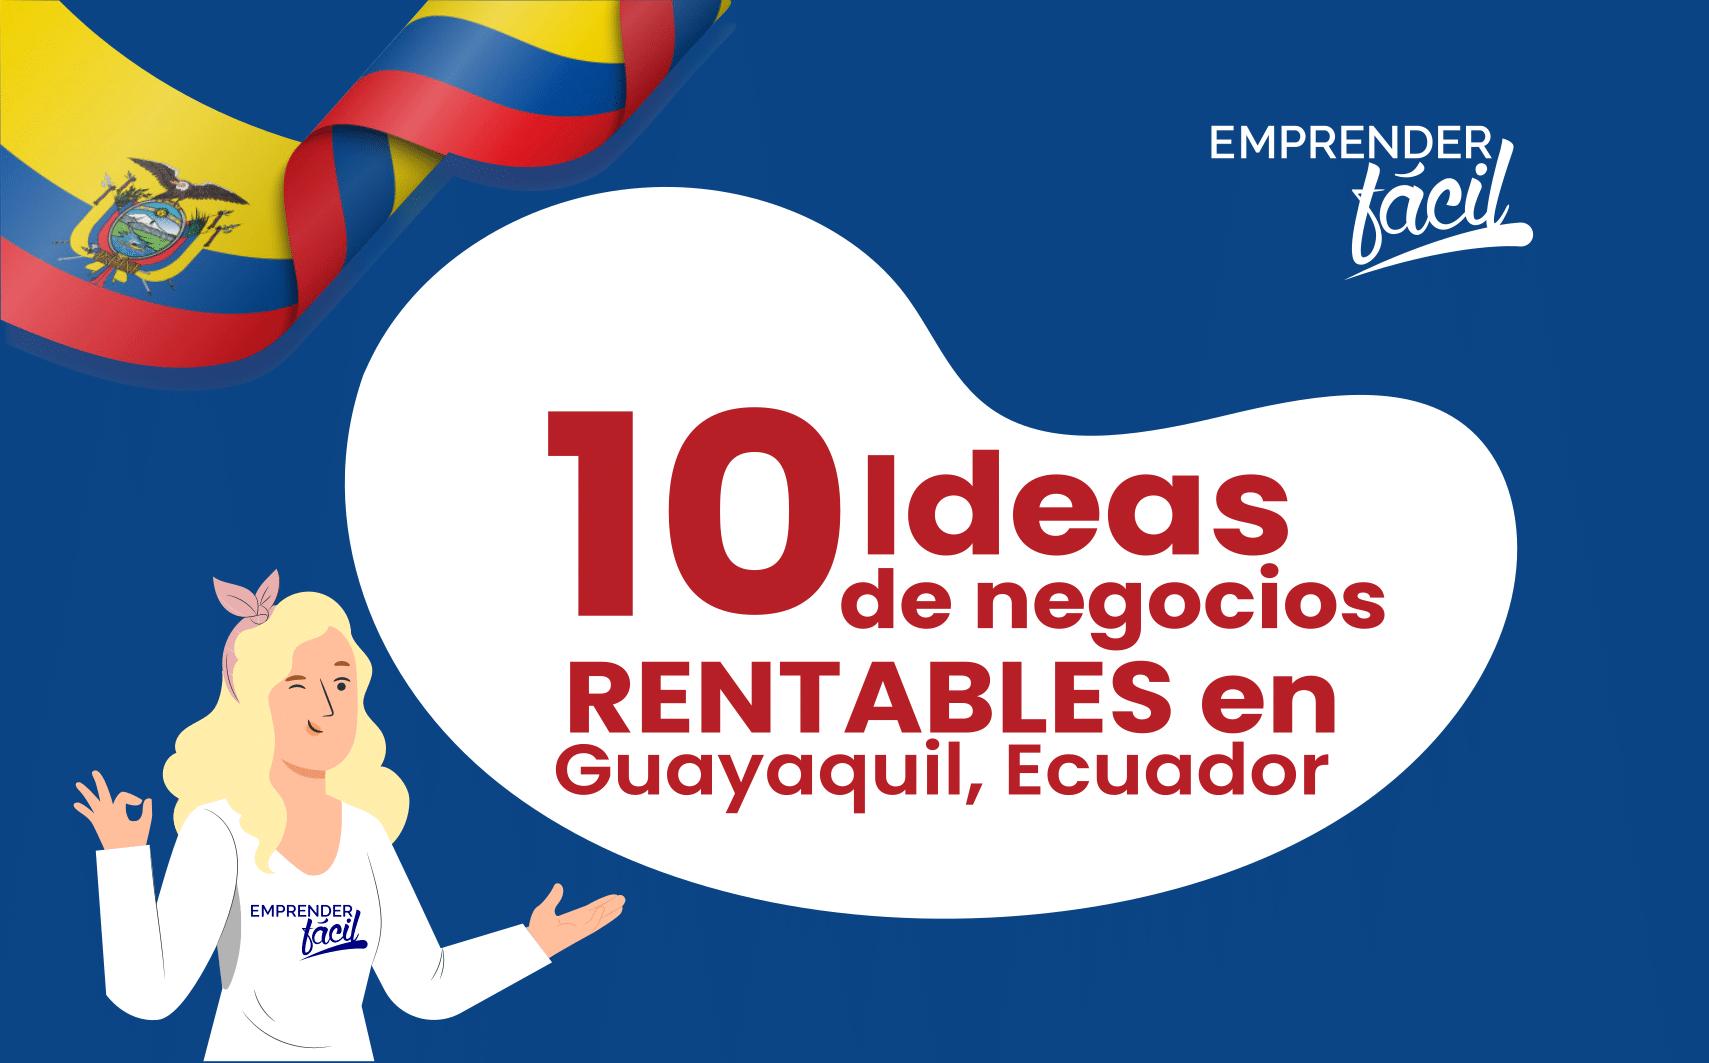 Negocios rentables en Guayaquil